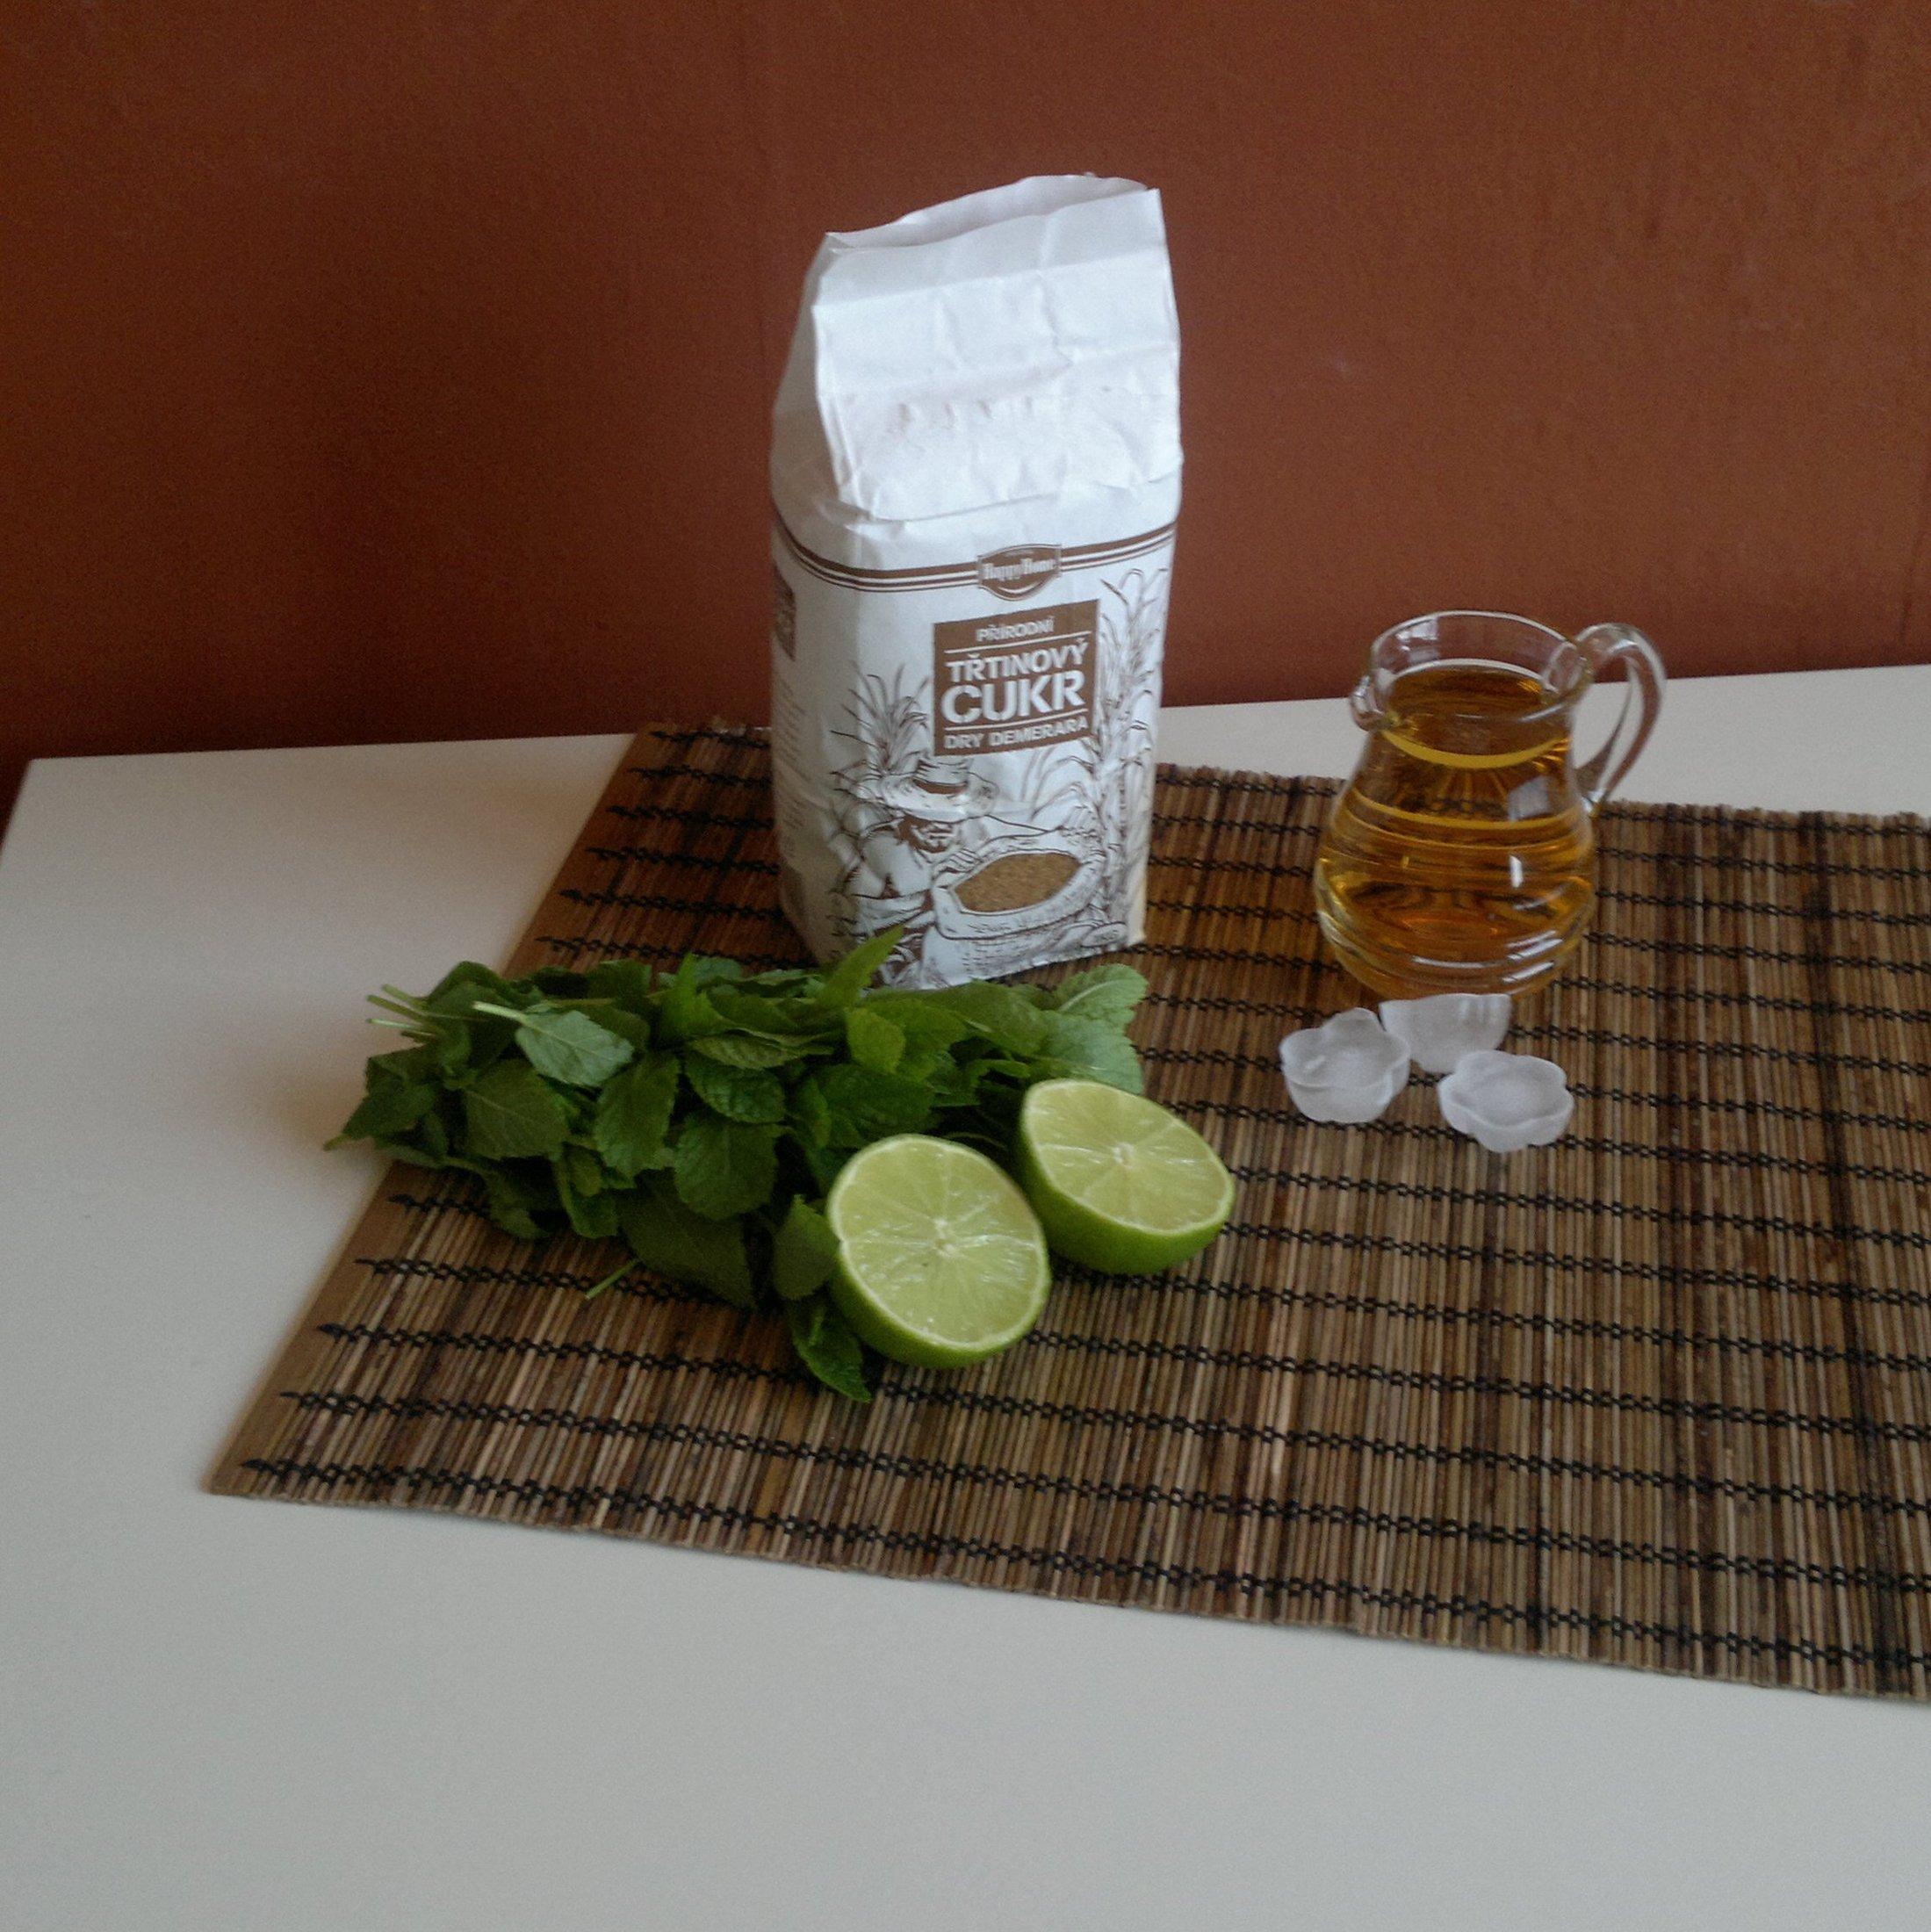 Recept Mojito virgin - Suroviny pro výrobu mojita, nezapomeňme na mátu, jež je nedílnou součástí mojita.